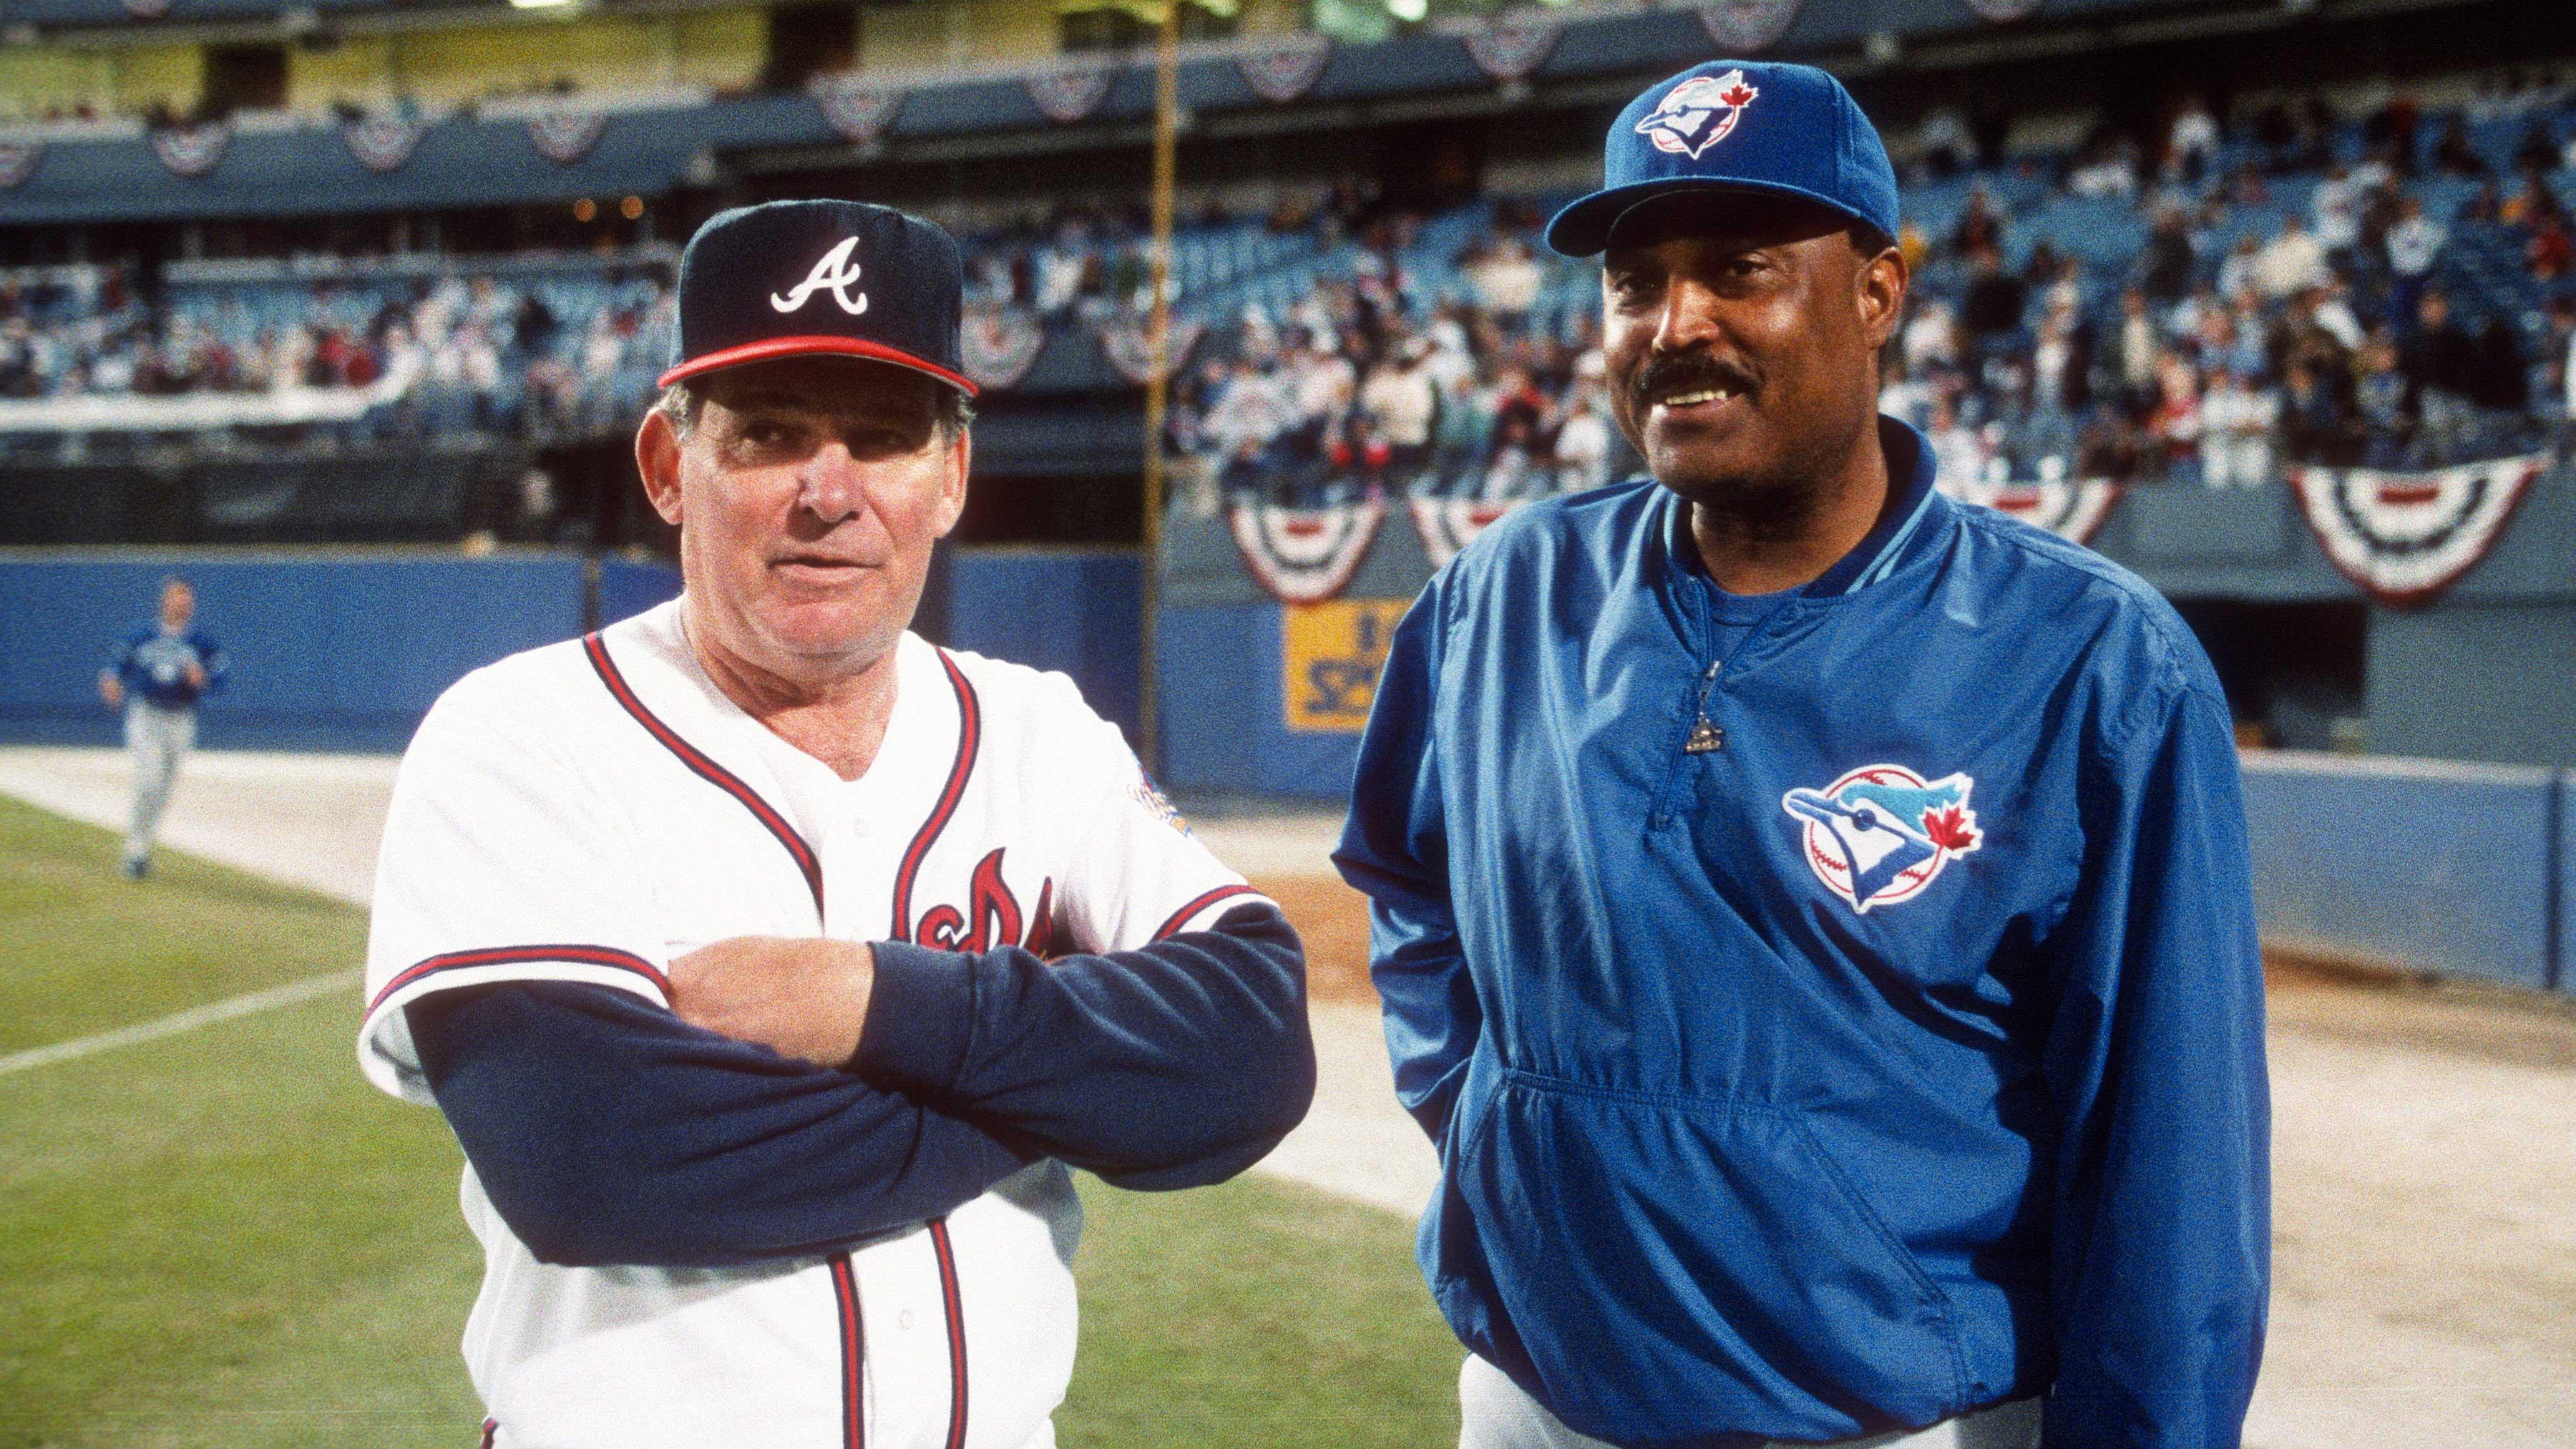 1992 World Series – Minnesota Twins v Atlanta Braves